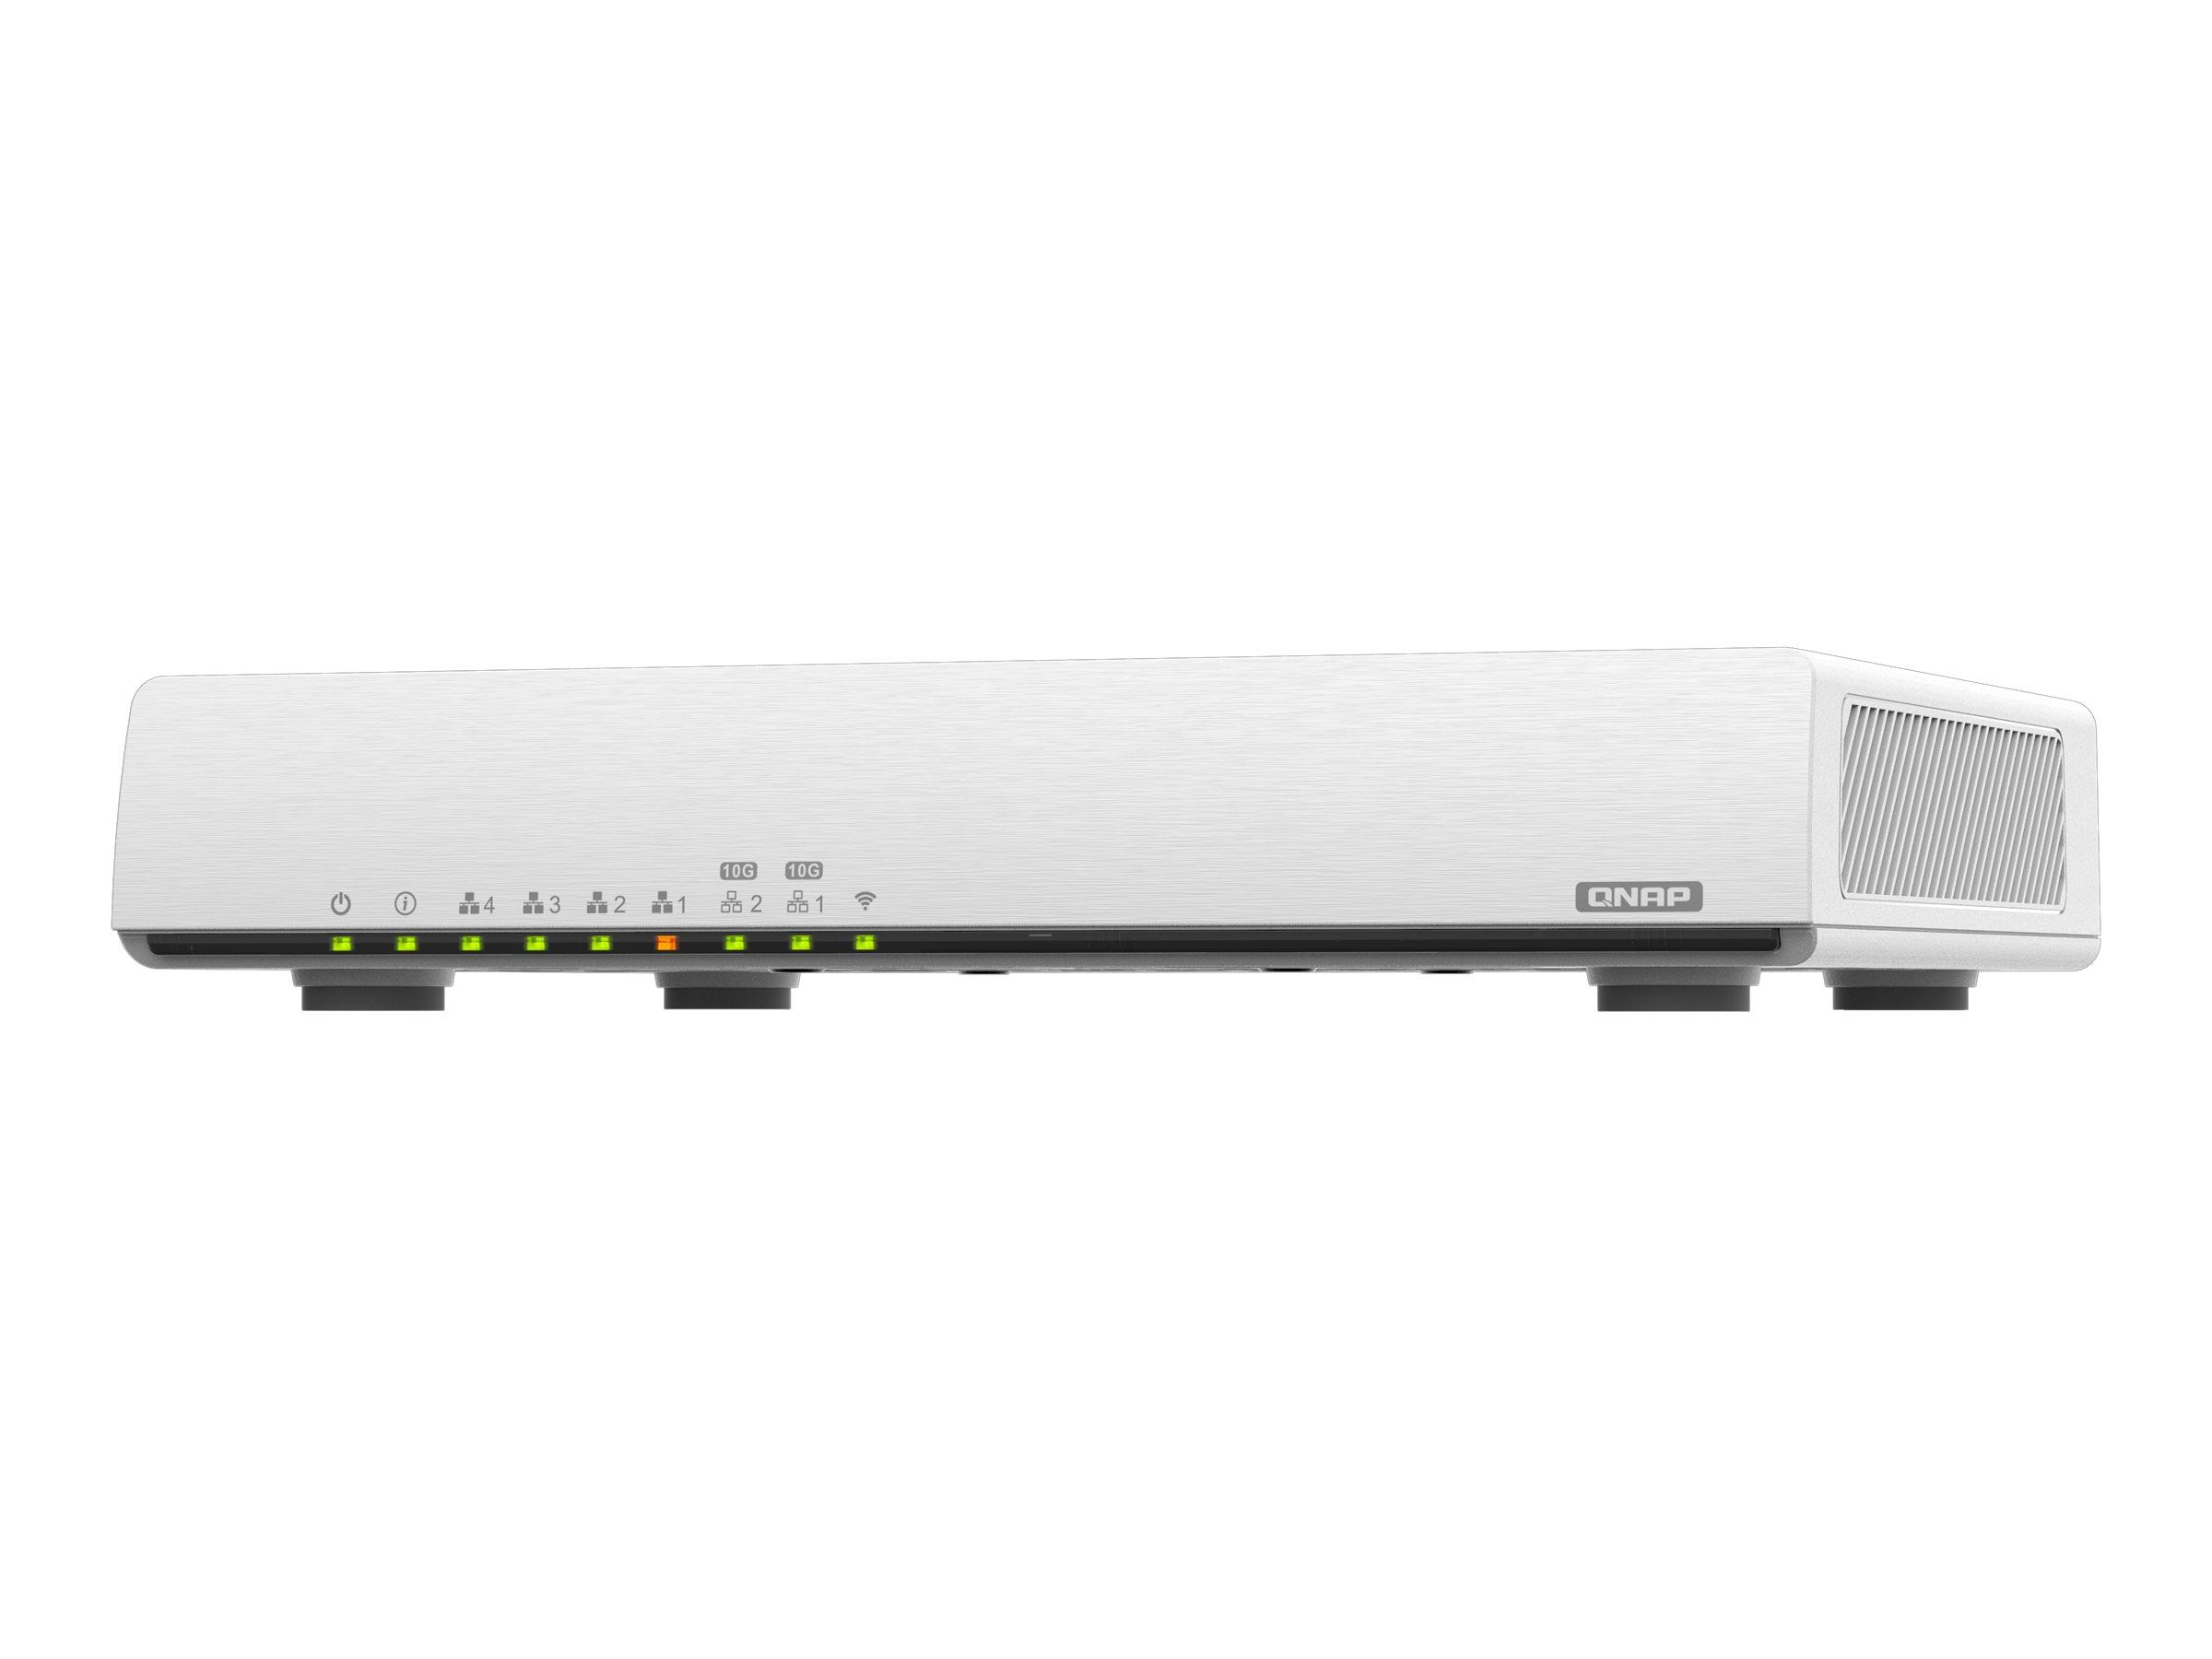 QNAP QHora-301W - wireless router - 802.11a/b/g/n/ac/ax - desktop